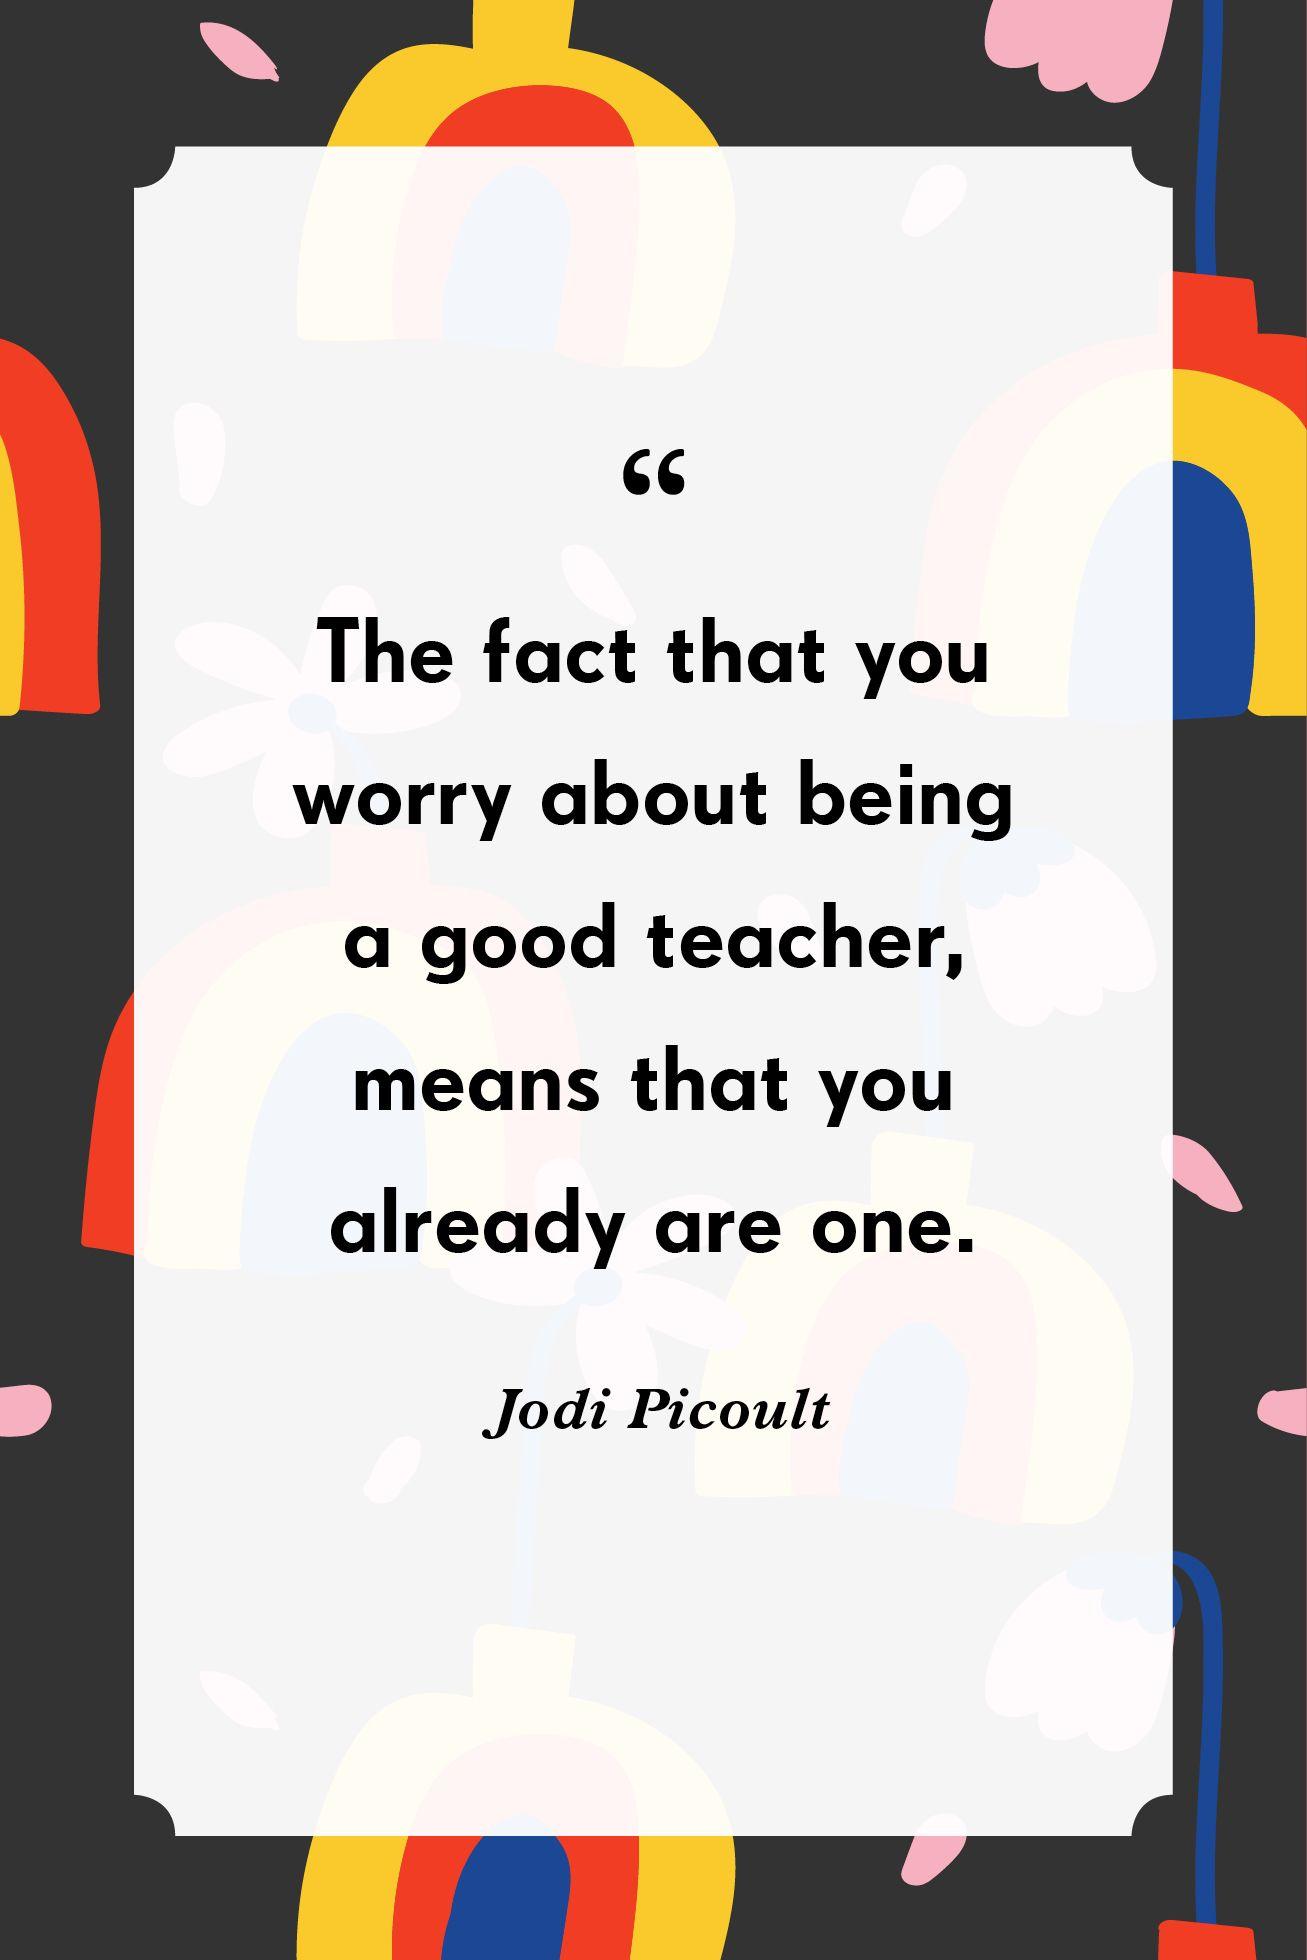 10 Best Teacher Quotes - Show Your Appreciation to Teachers